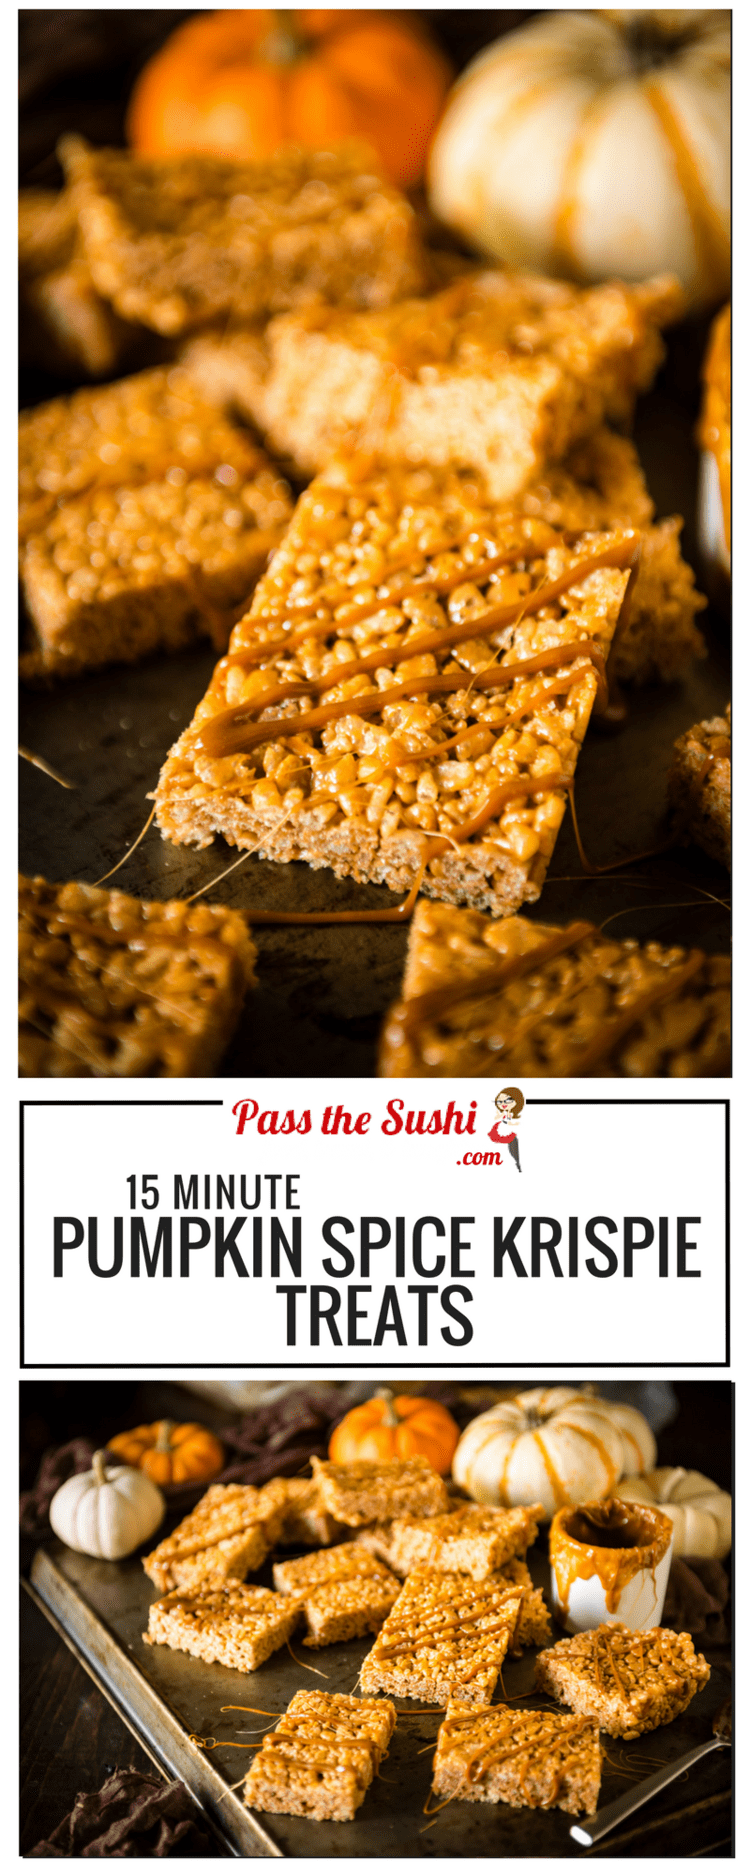 Pumpkin Spice Krispie Treats | Kita Roberts PassTheSushi.com